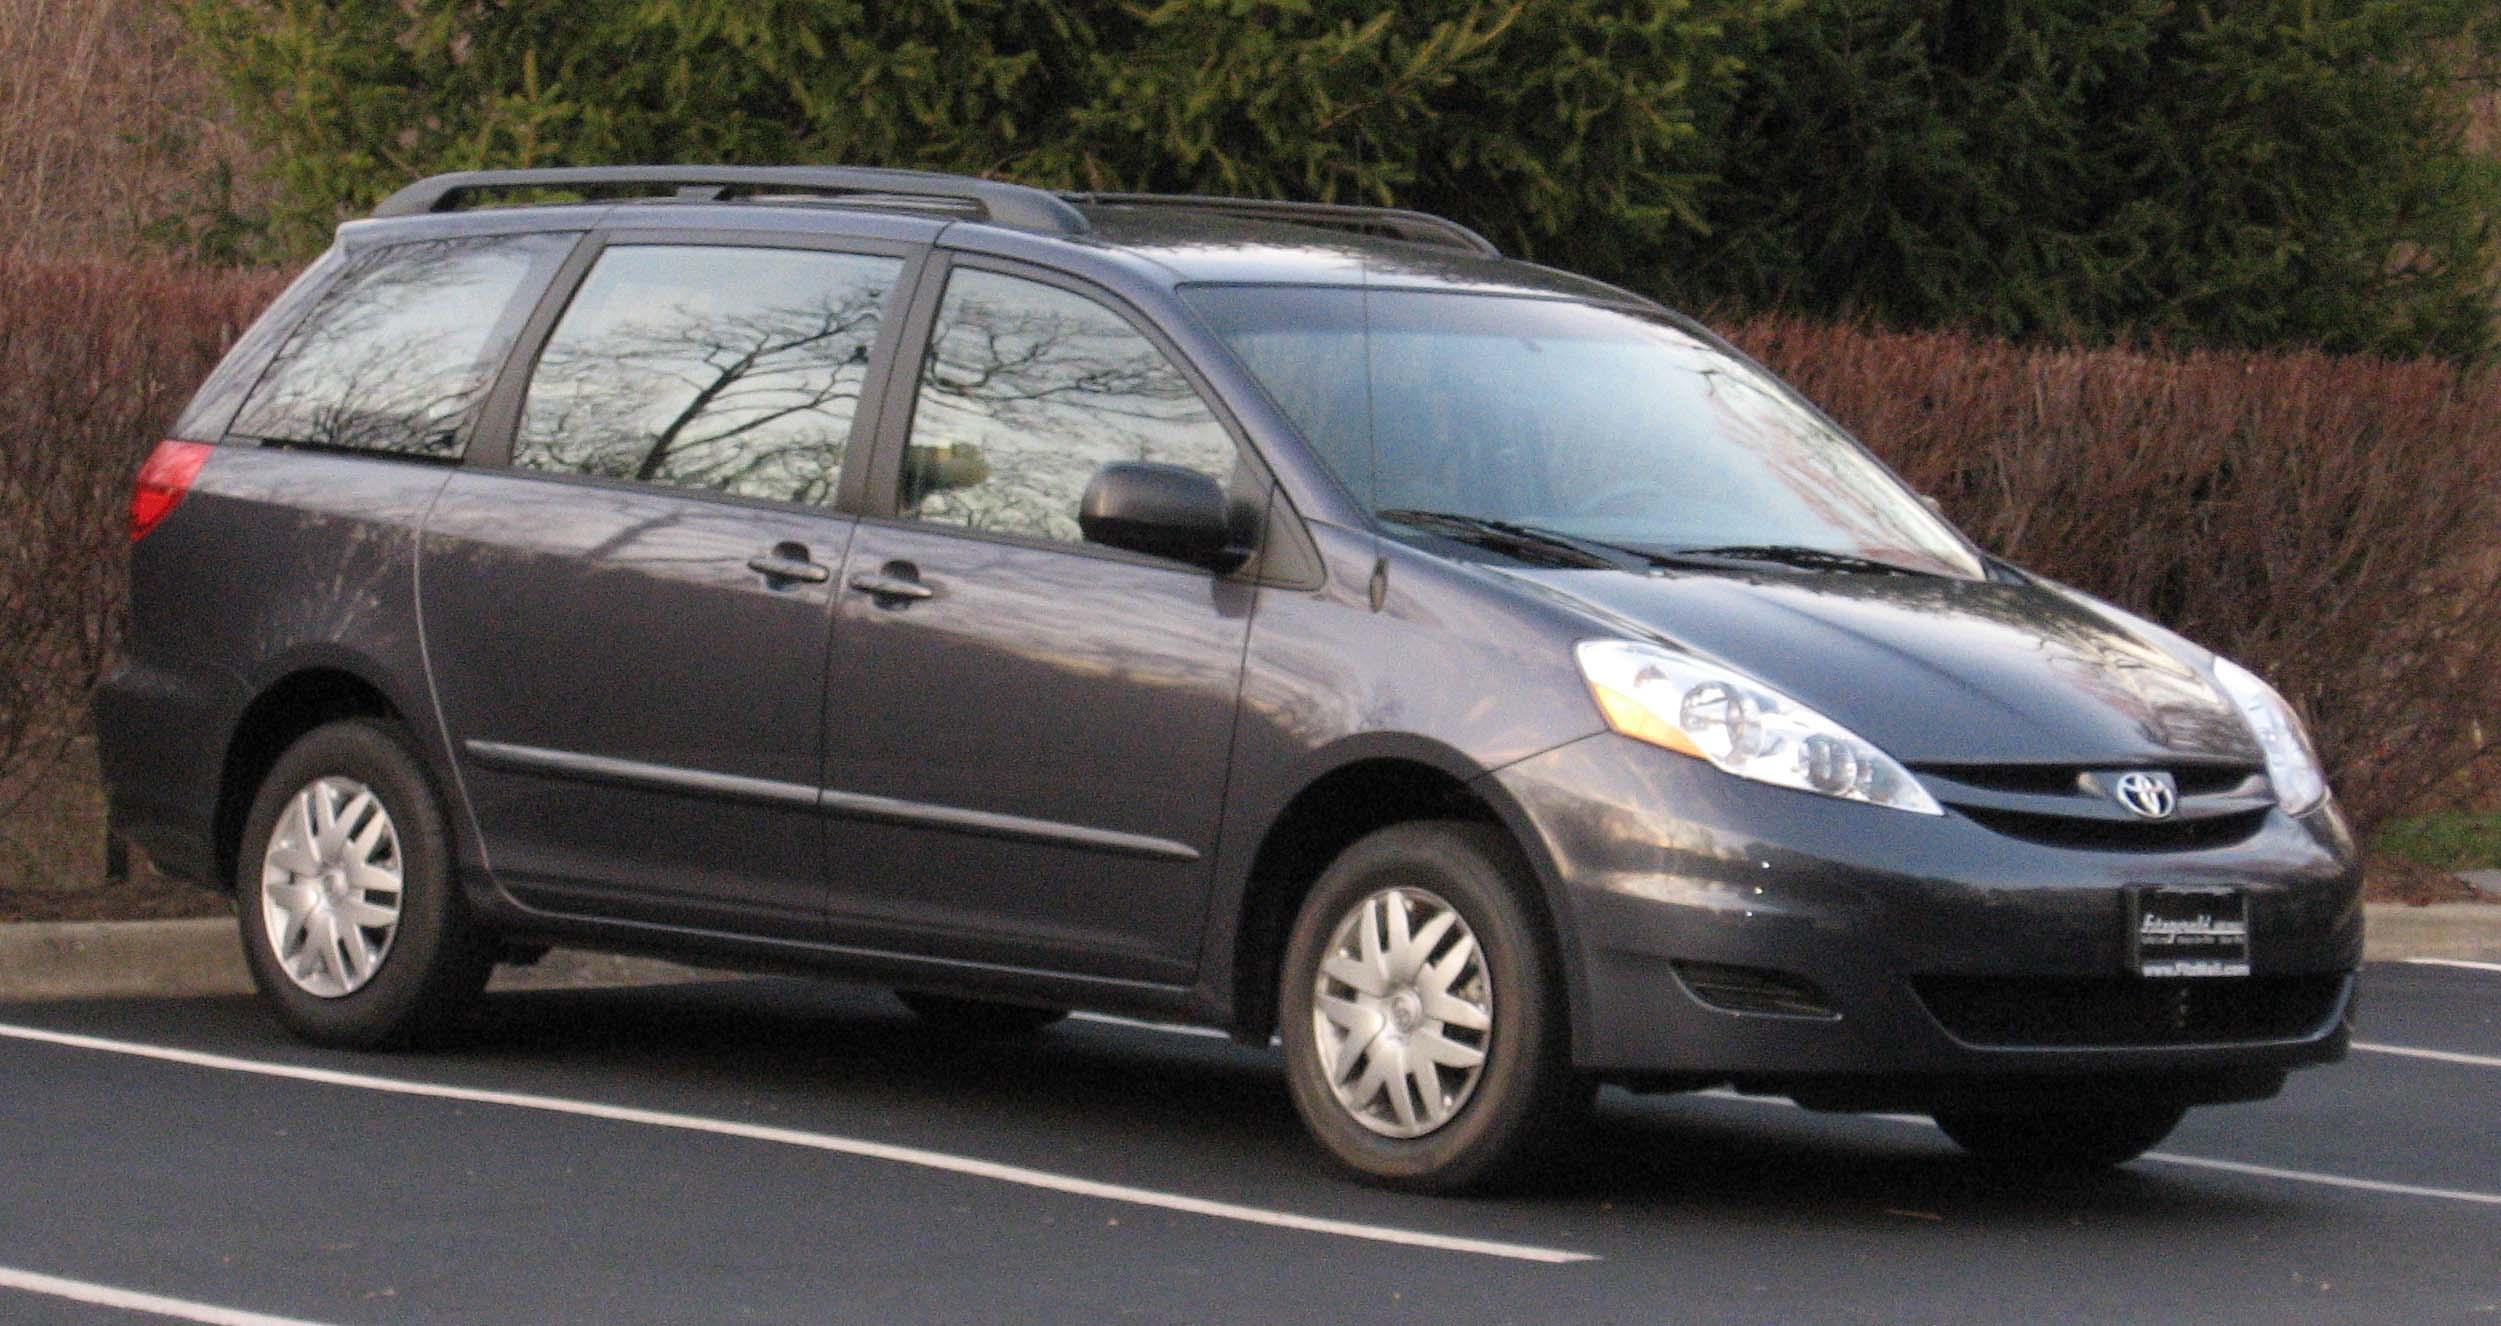 File Toyota Sienna LEjpg Wikimedia Commons - 2006 sienna